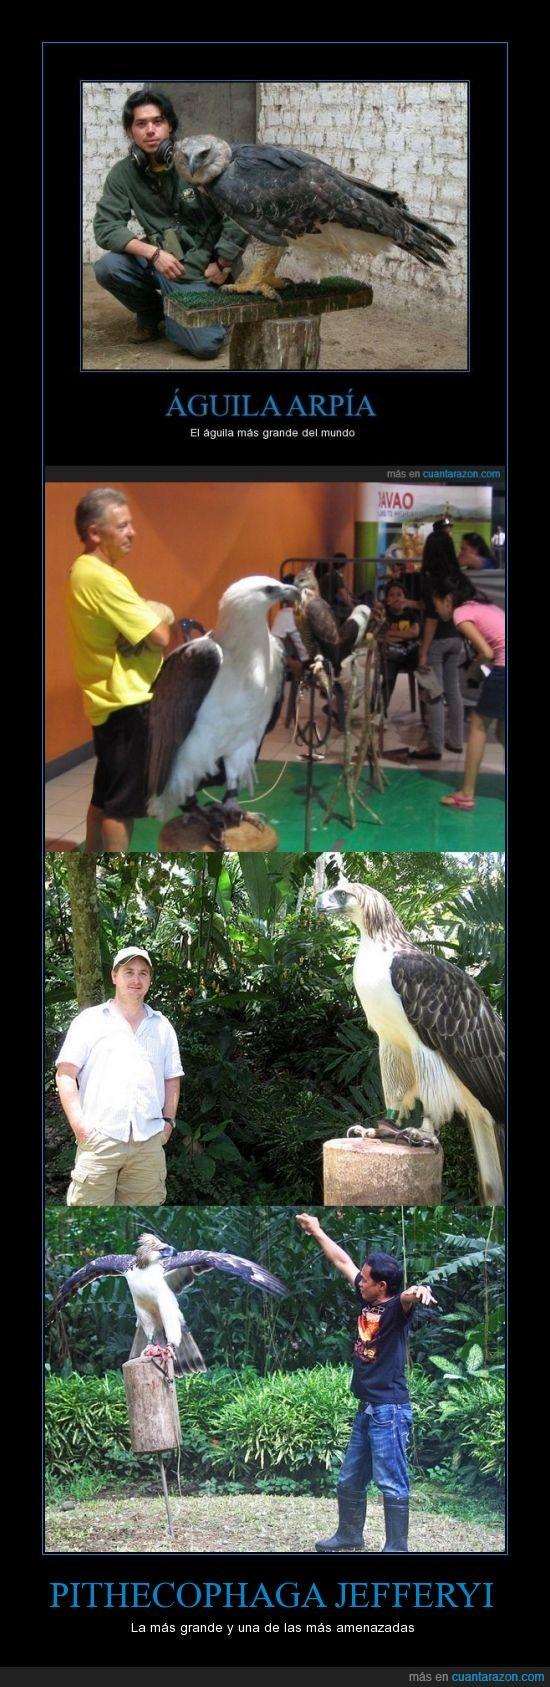 aguila filipina,amenazada,animal,ave,gigante,grande,pithecophaga